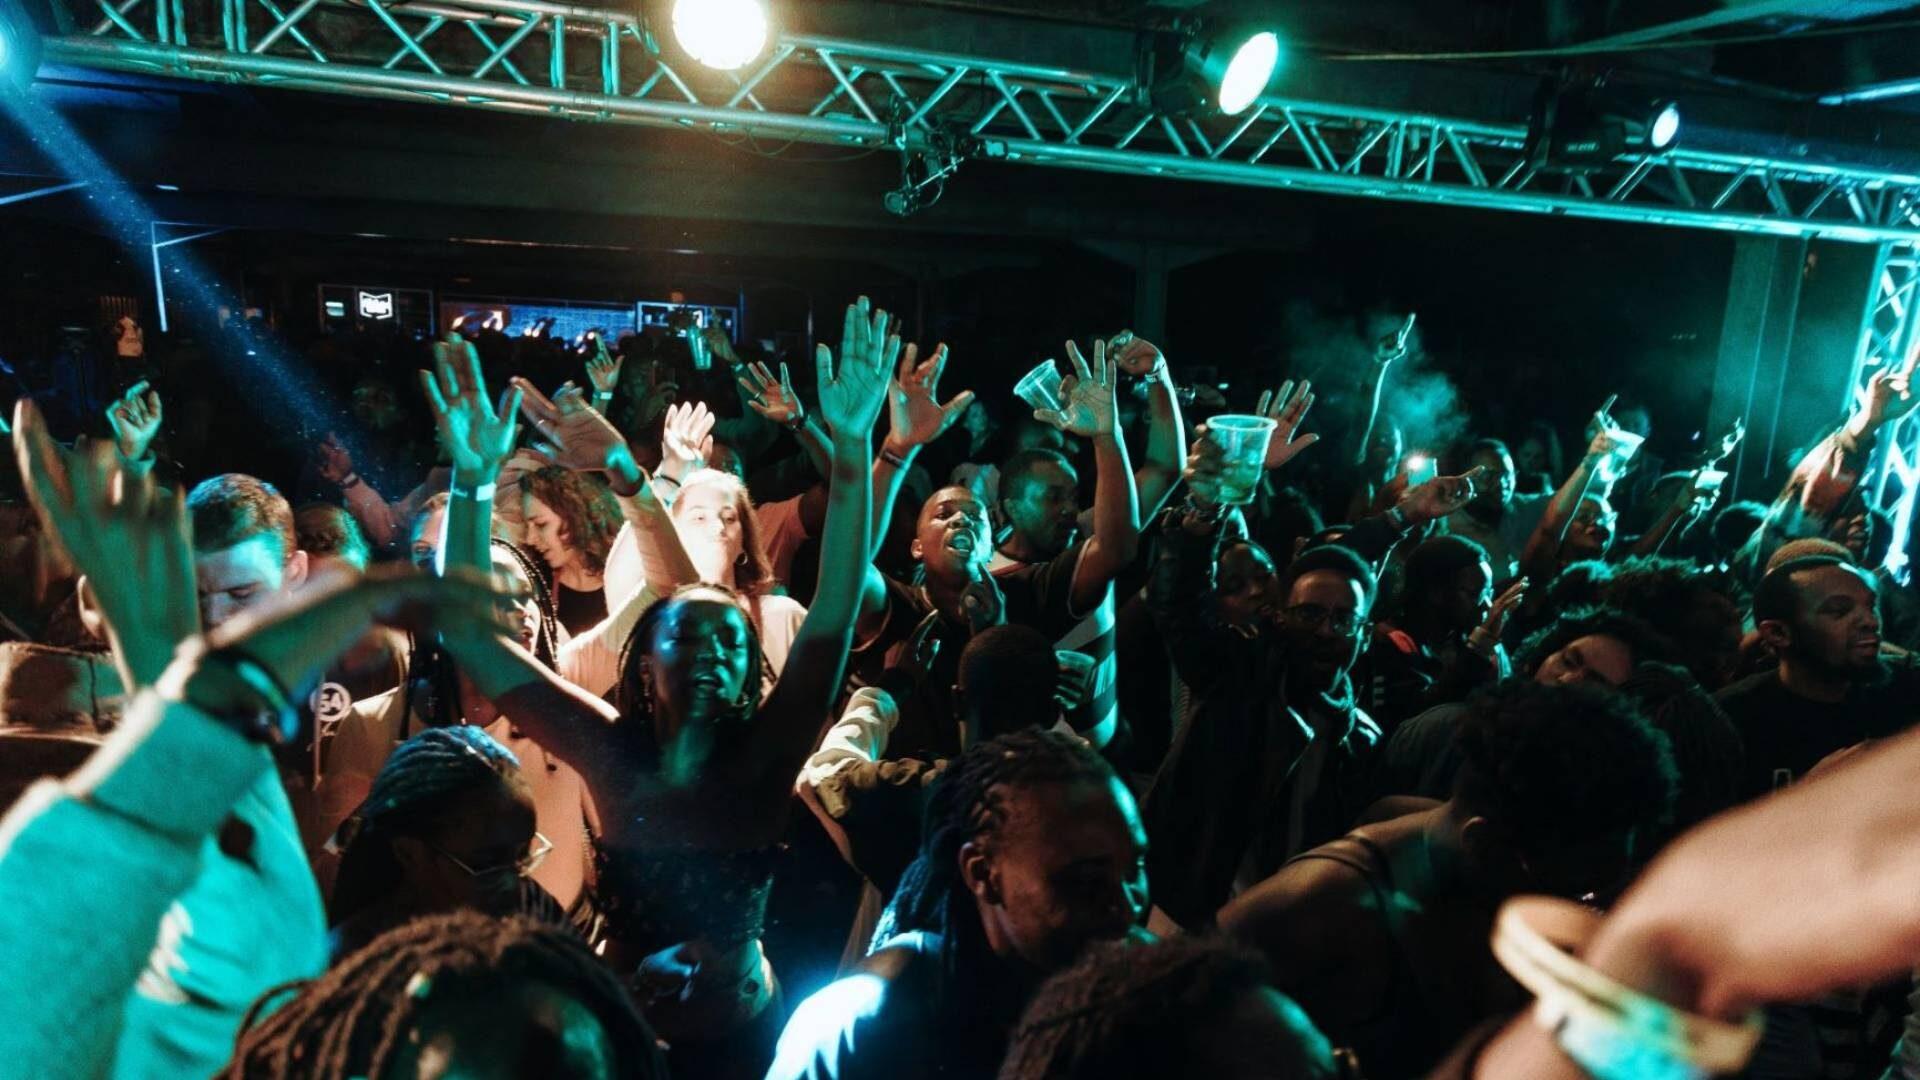 Boiler room Ballantine's true music nairobi